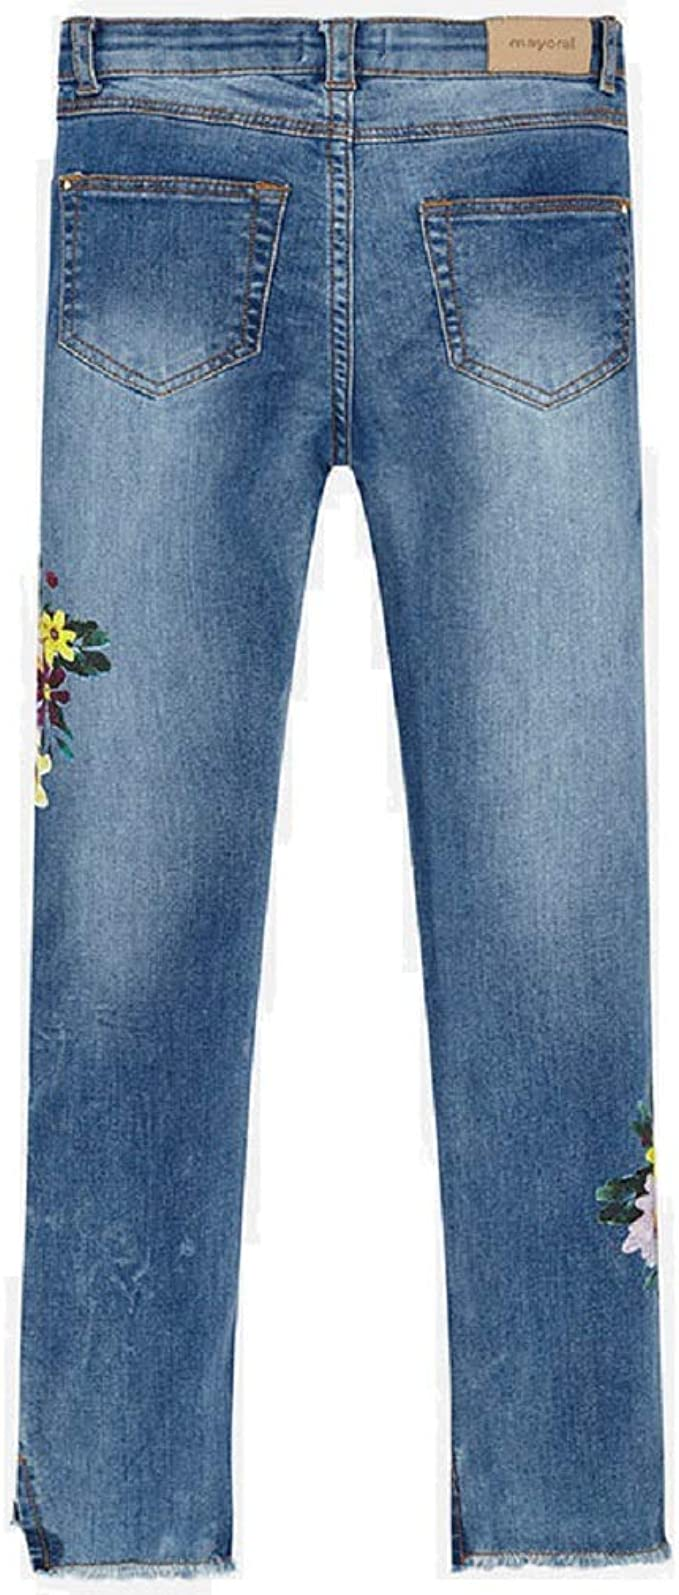 Mayoral 6503 Pantaloni Lunghi in Jeans da Bambina Modello